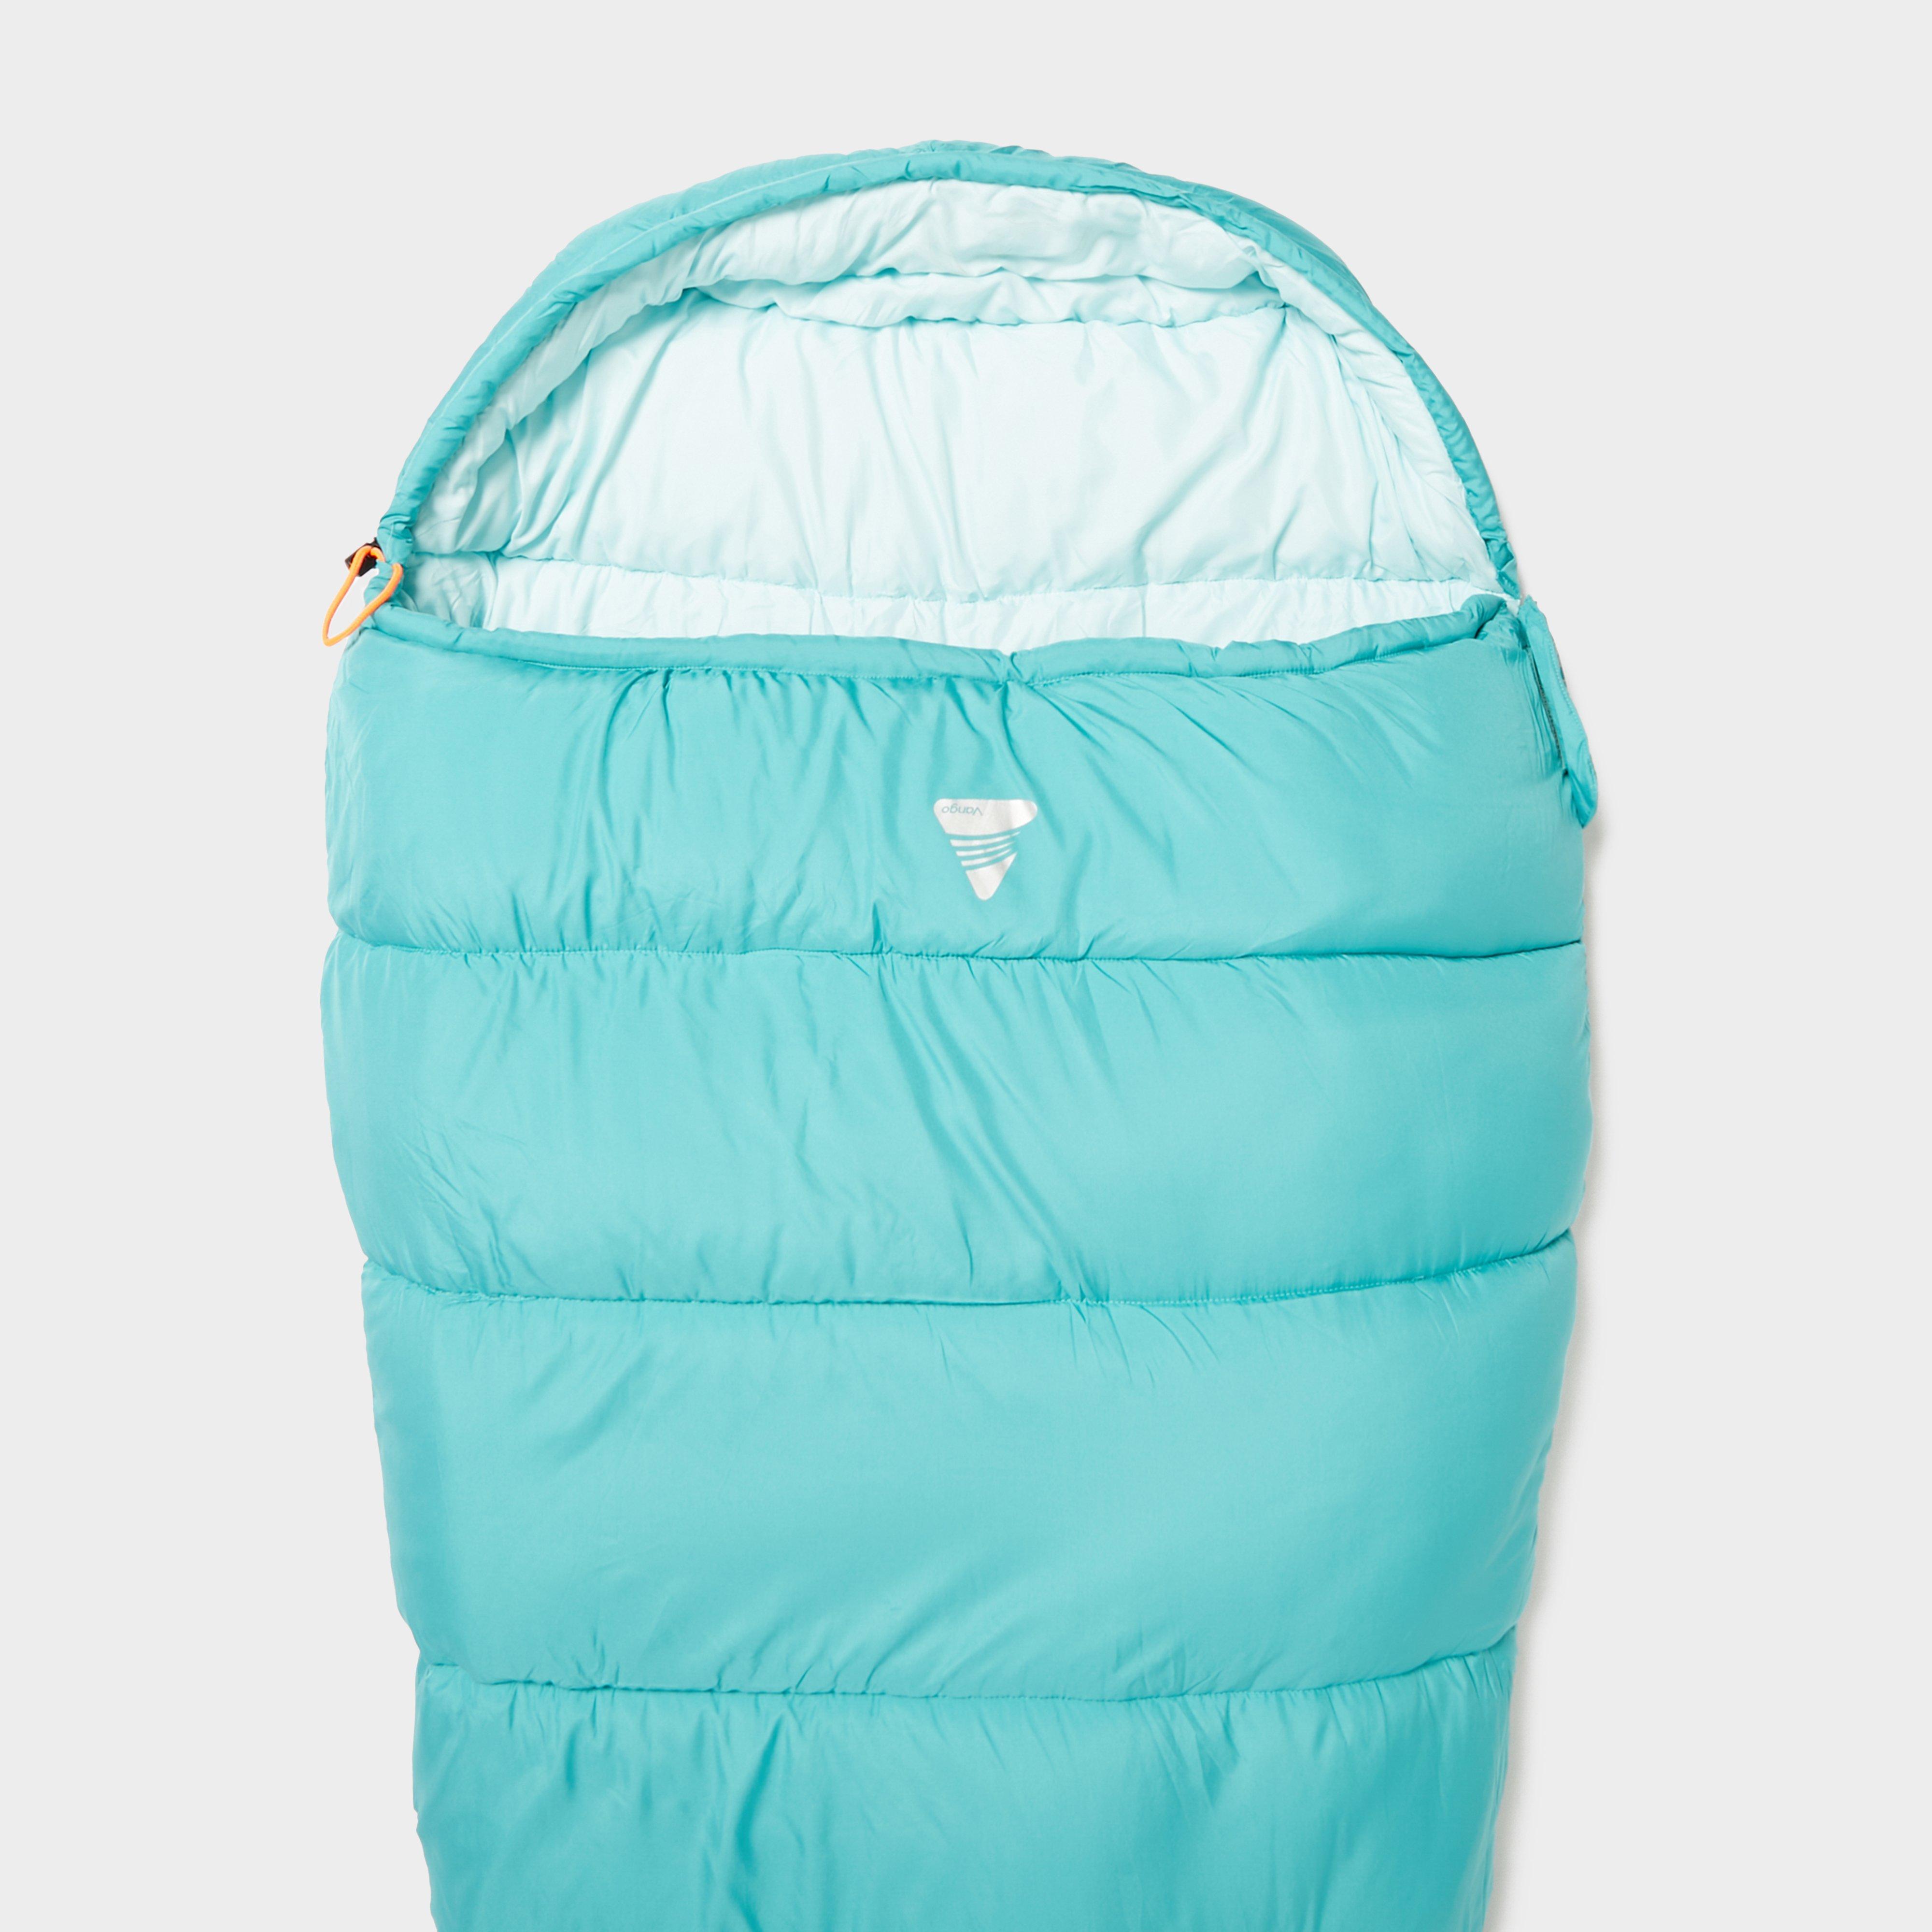 Vango Vango Starlight 250s Sleeping bag